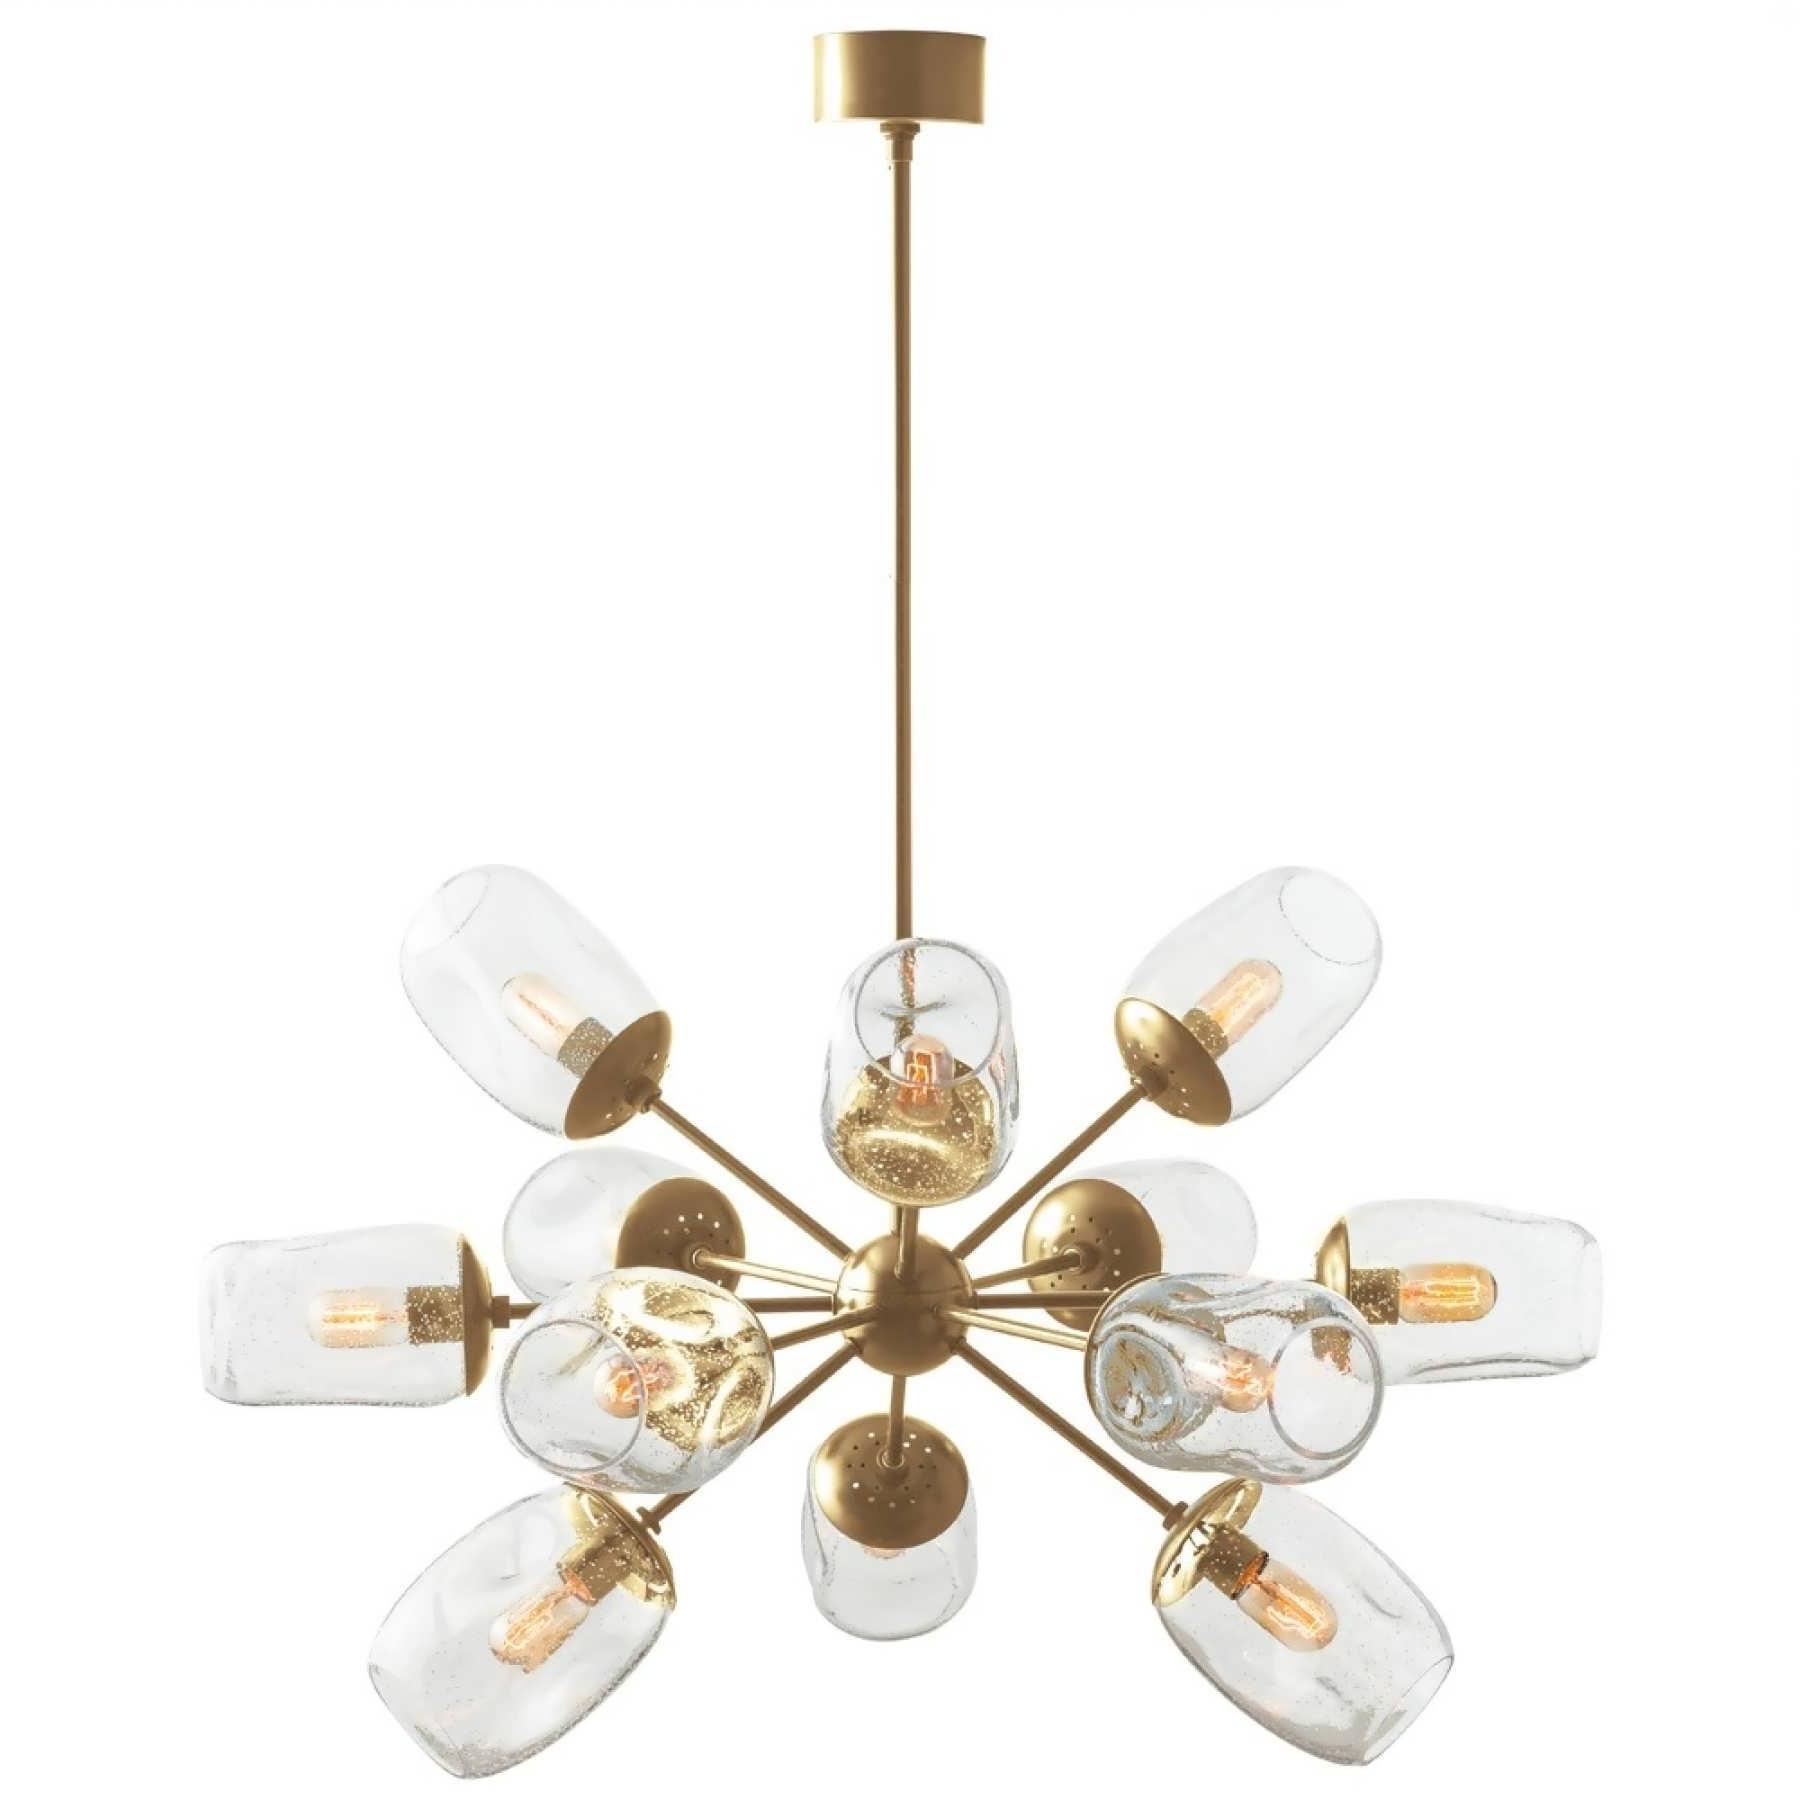 Gold Modern Chandelier For Popular Chandeliers Design : Marvelous Dining Room Chandeliers Large Modern (Gallery 15 of 20)